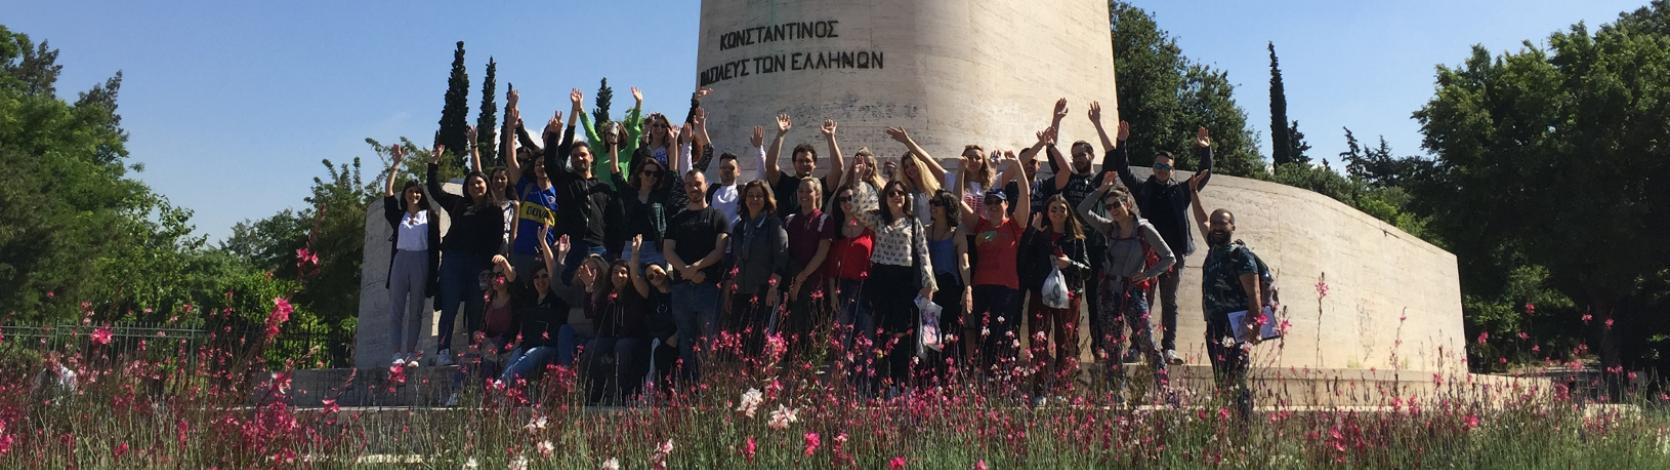 6bbbf3781 Teacher Education Program | Athens University of Economics and Business